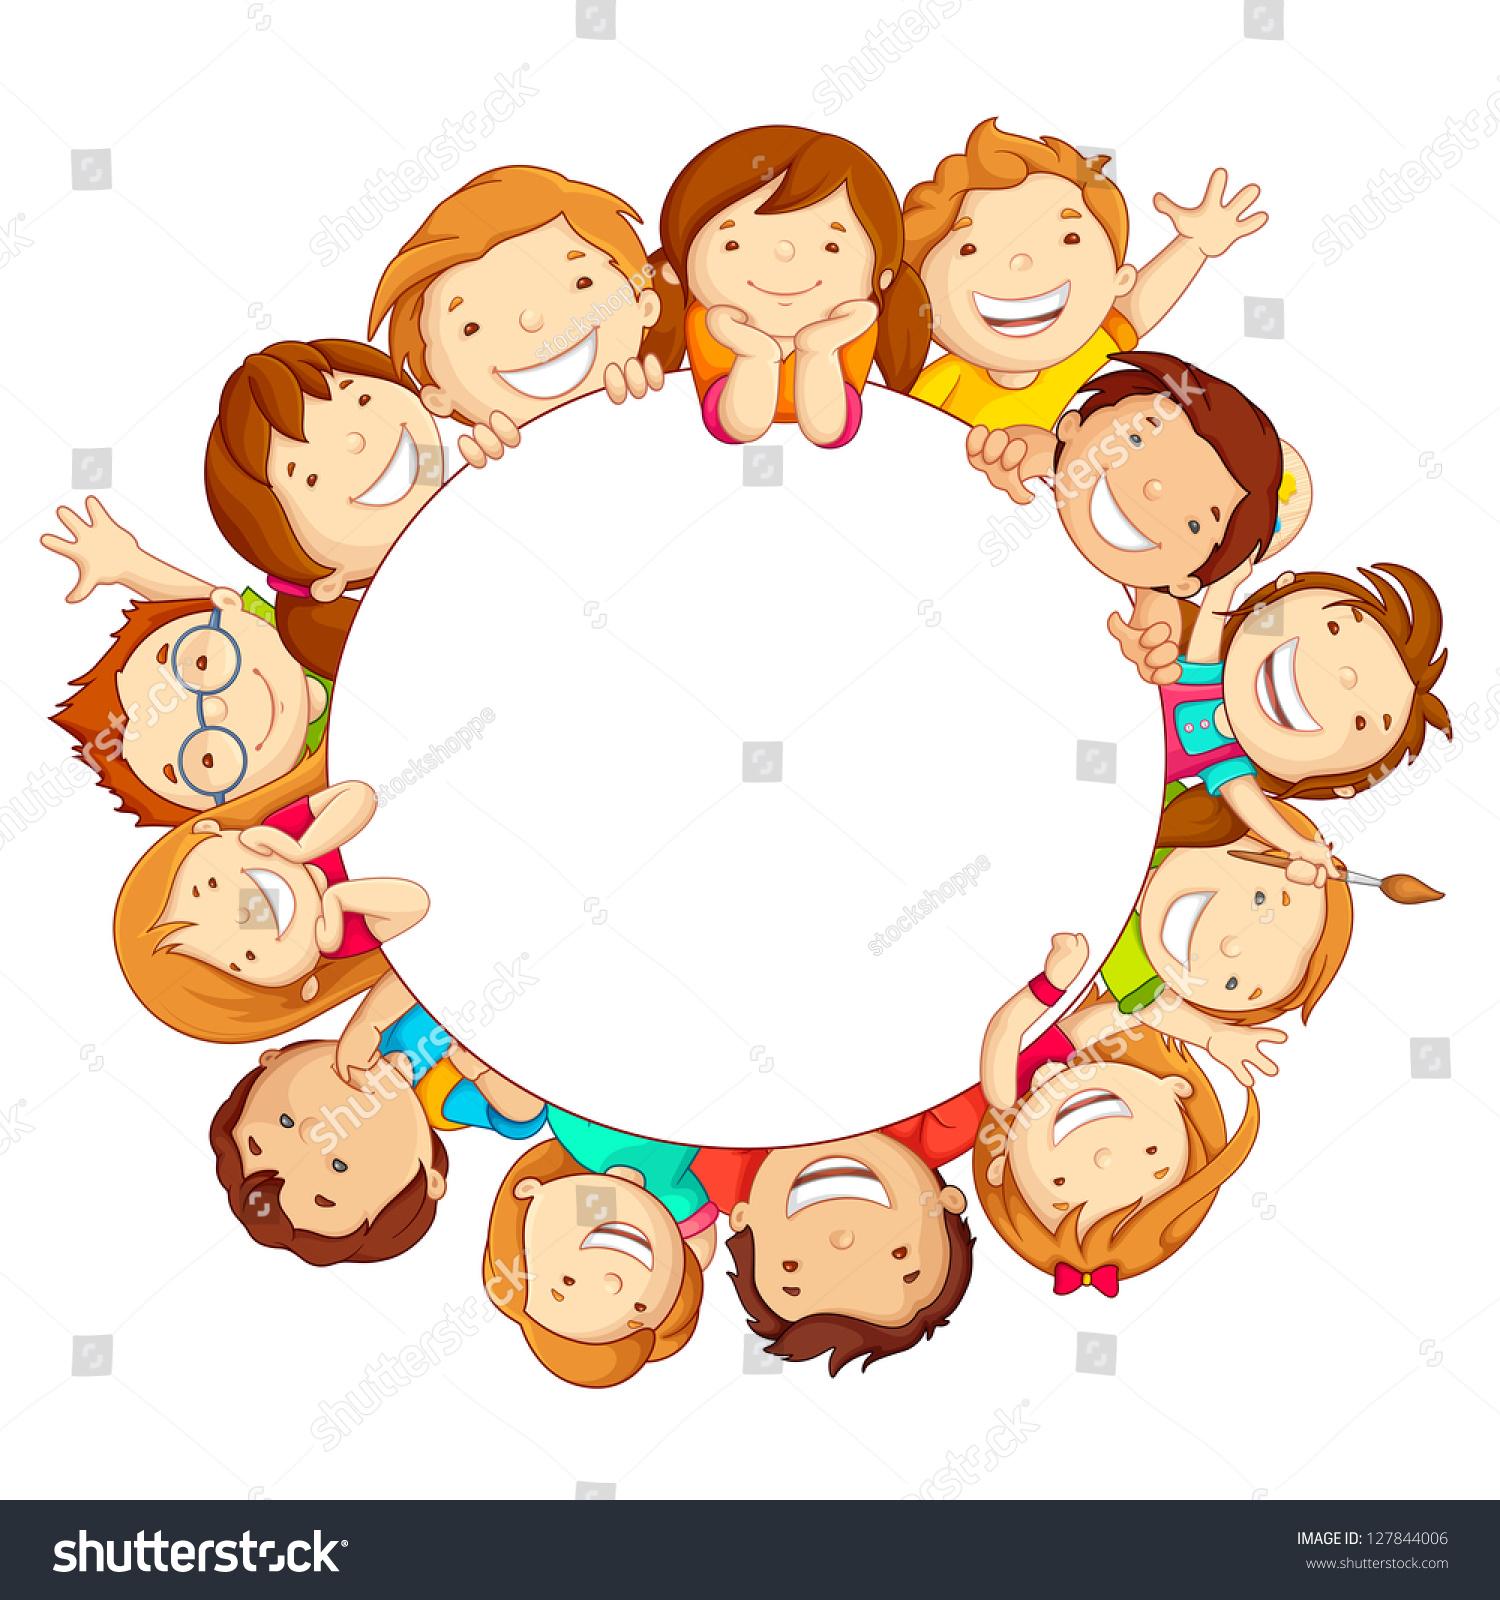 Vector Illustration Of Happy Kids Around Circular Copy